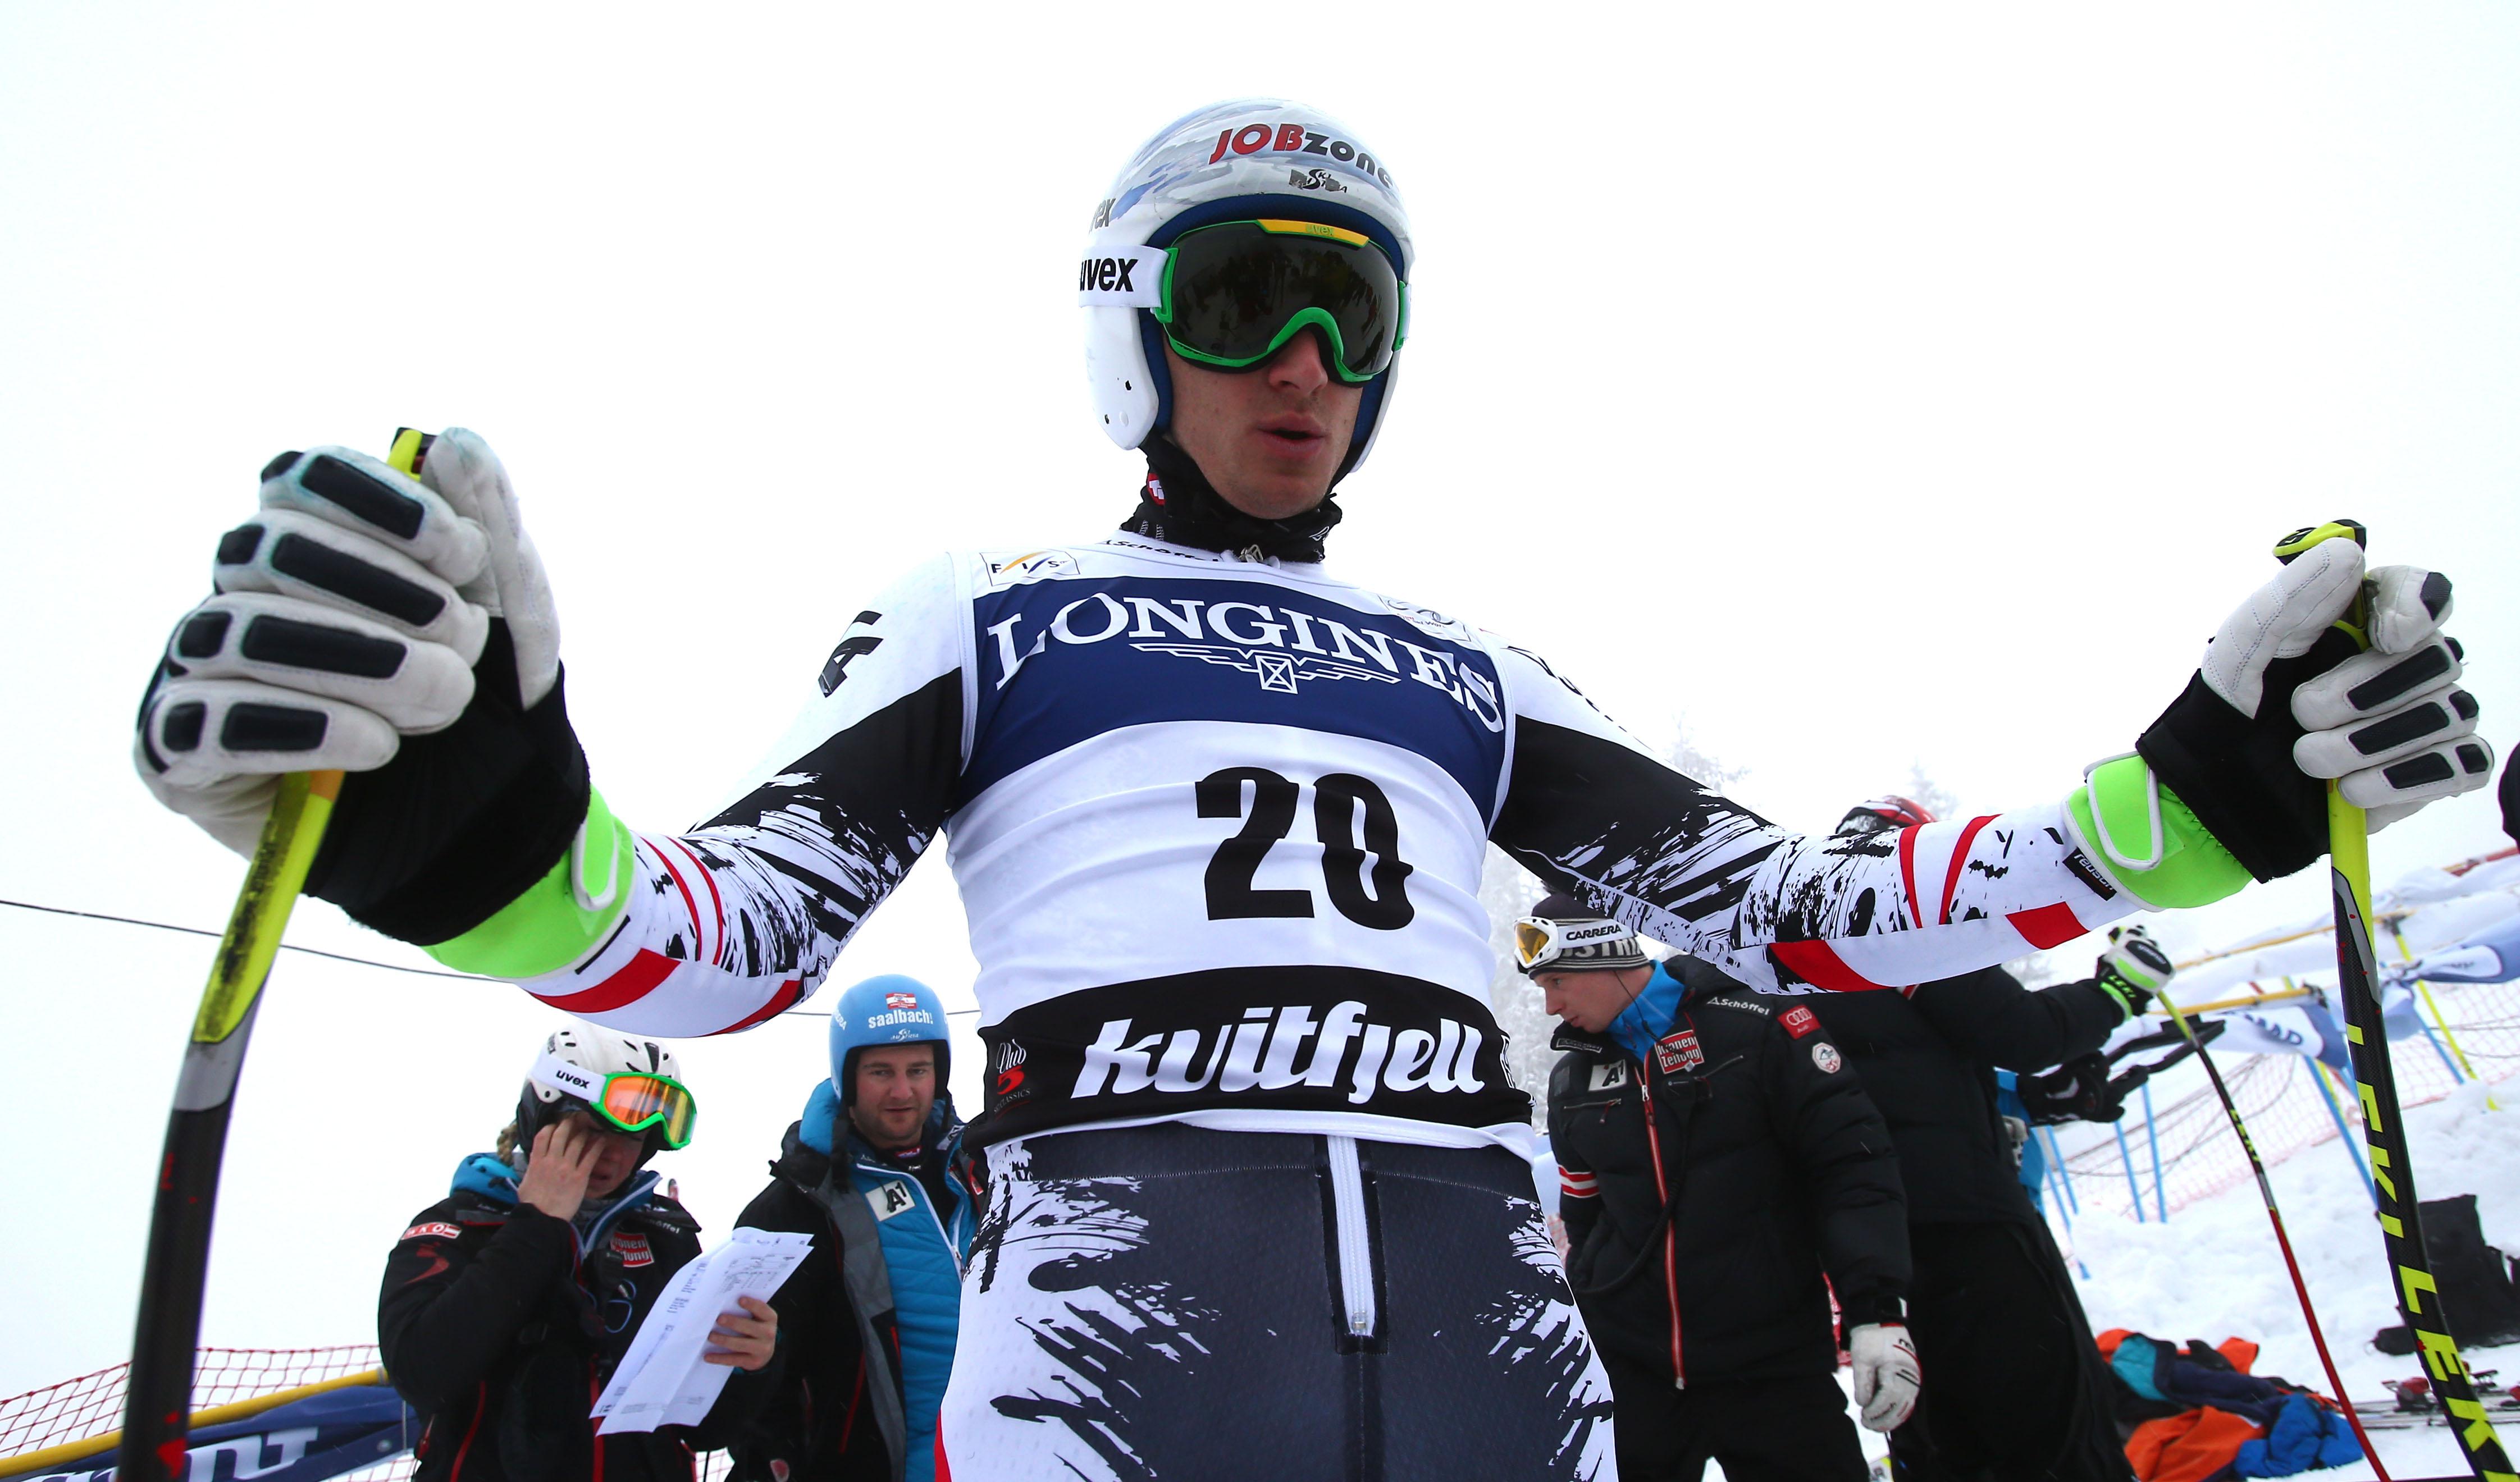 Austria's Matthias Mayer  prepares before the start  an alpine ski, men's World Cup downhill training, in Kviitfjell, Norway, Friday, Feb. 28 , 2014